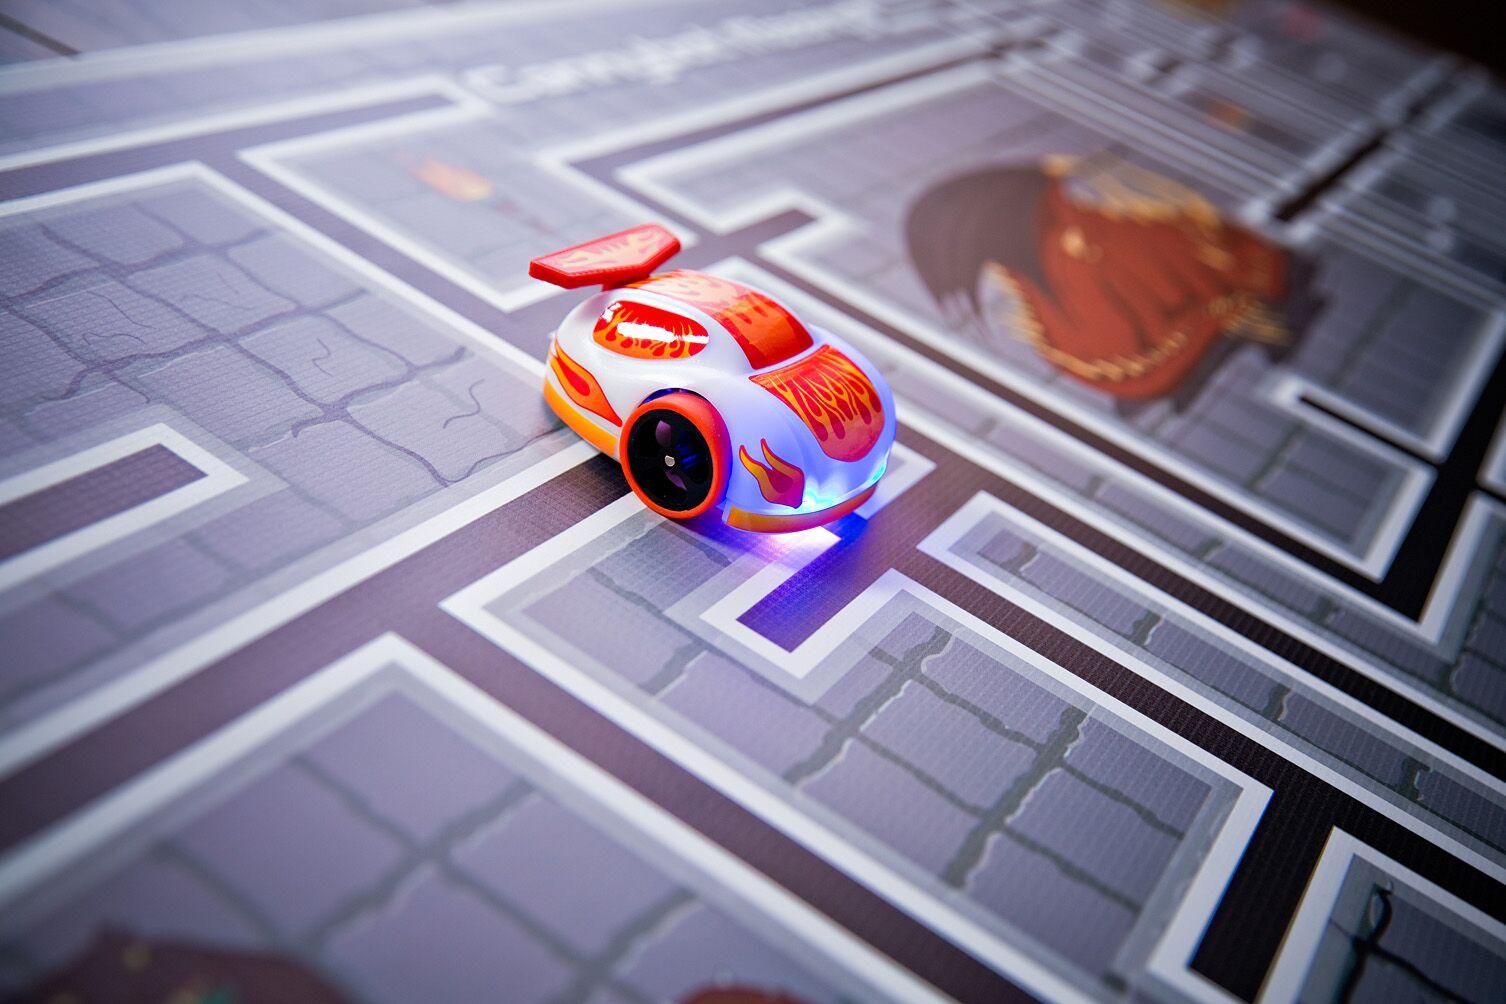 Cannybots 3D printed fun!